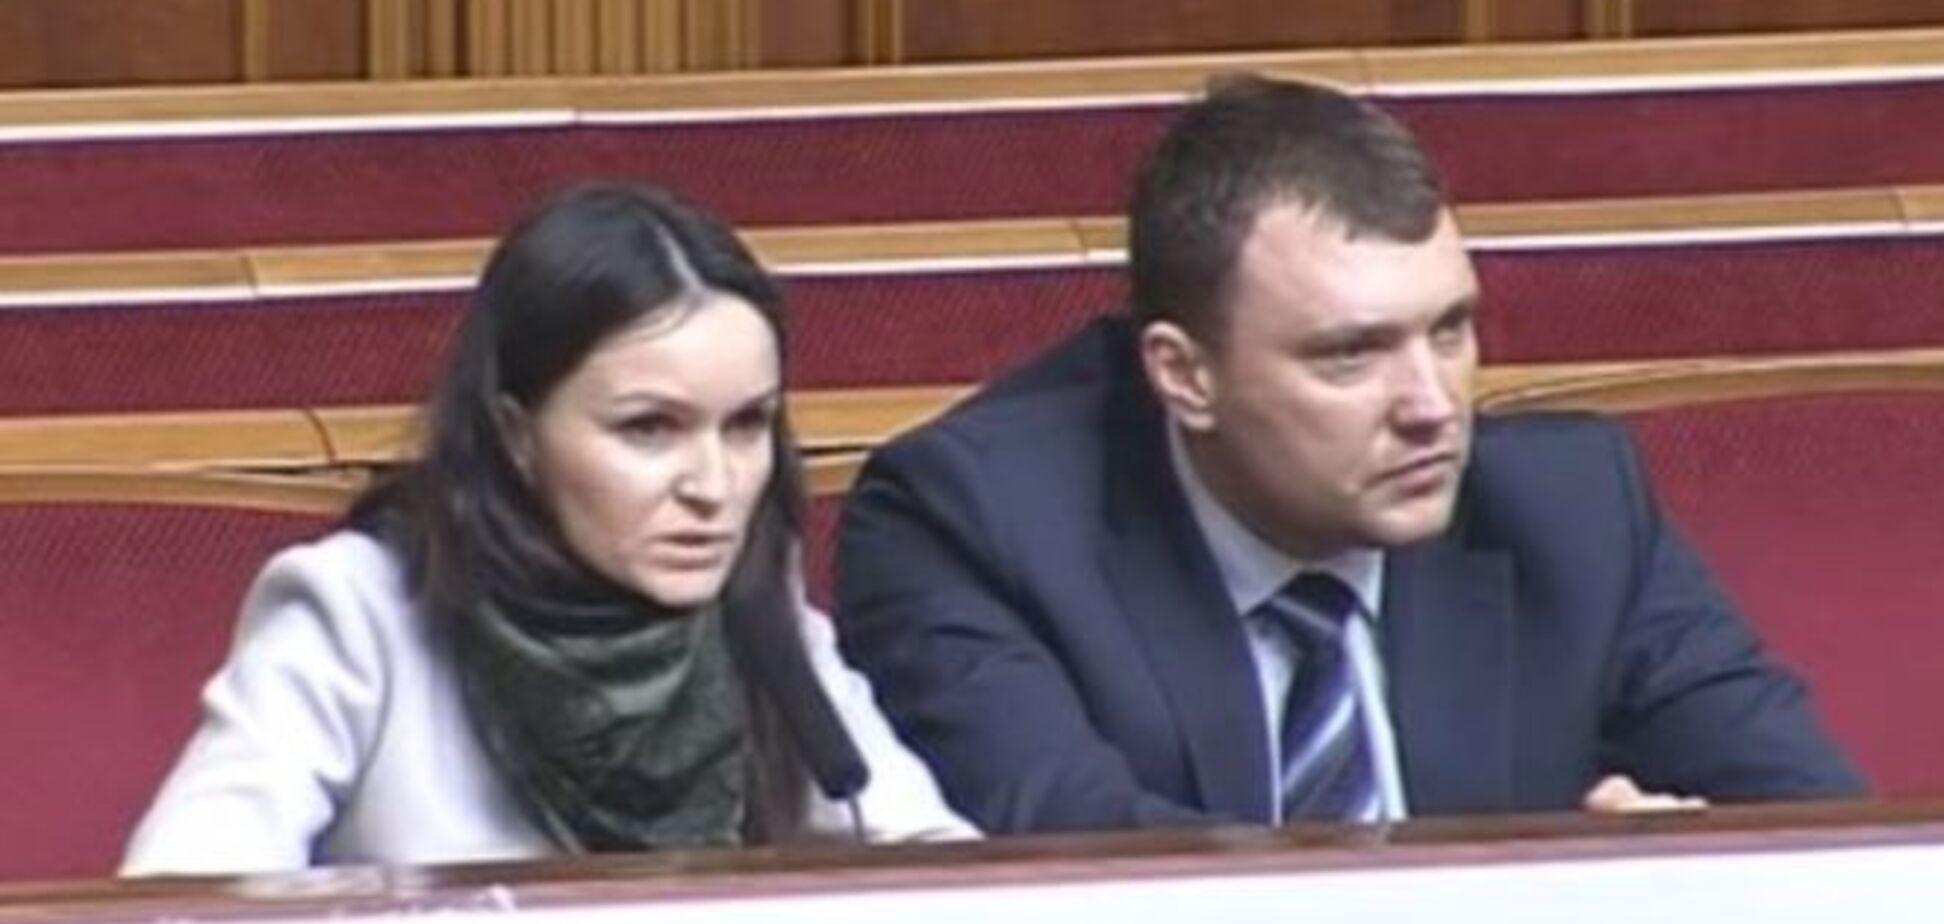 Рада дала добро на арест трех судей Печерского суда